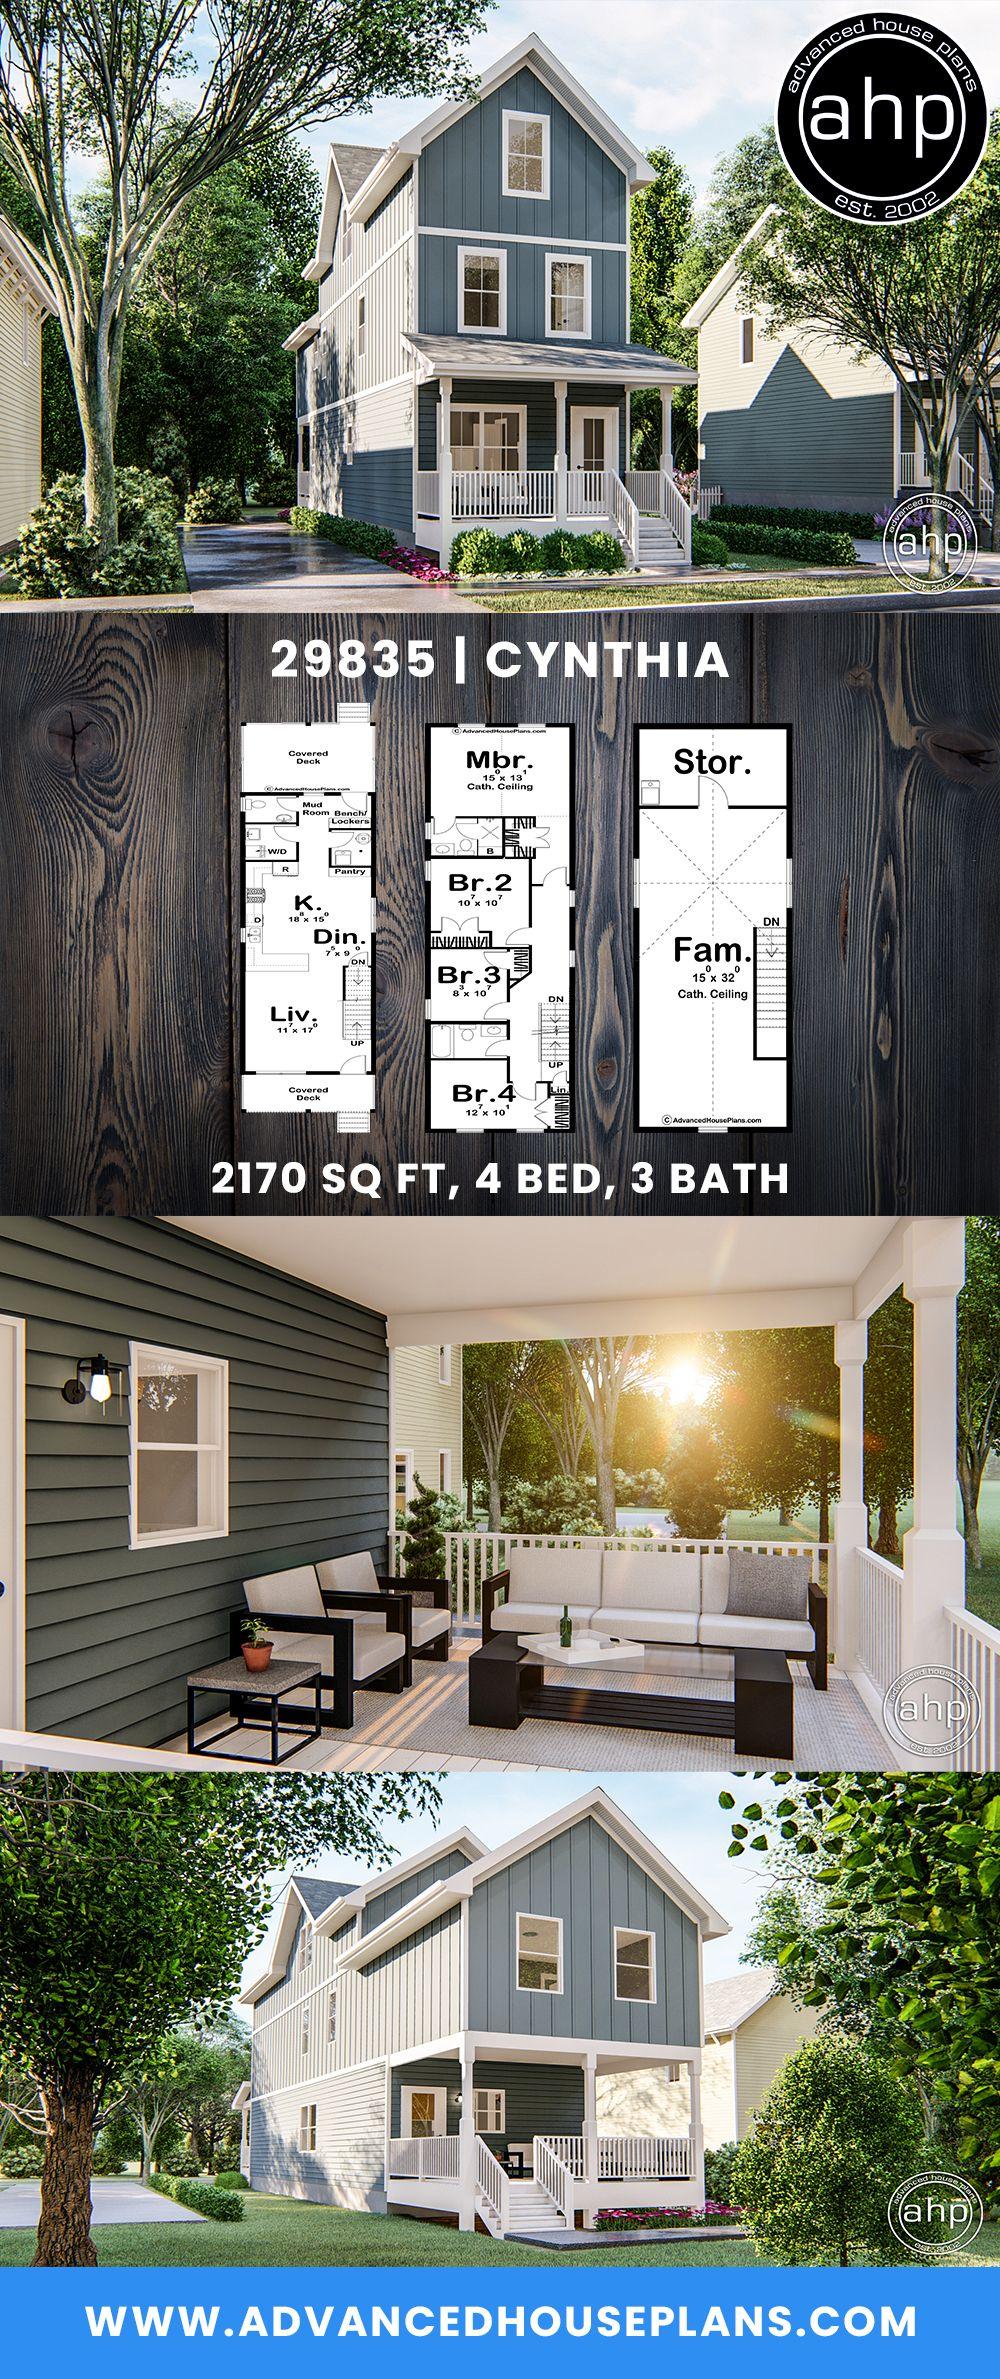 Traditional Style Narrow House Plan | Cynthia   #floorplan #homeplan #houseplan #homedesigner #architecturaldesigner #homesweethome #dreamhome #shotgunhouse #narrowhouseplan #narrowhome #rendering #curbappeal #designbuild #readytobuild